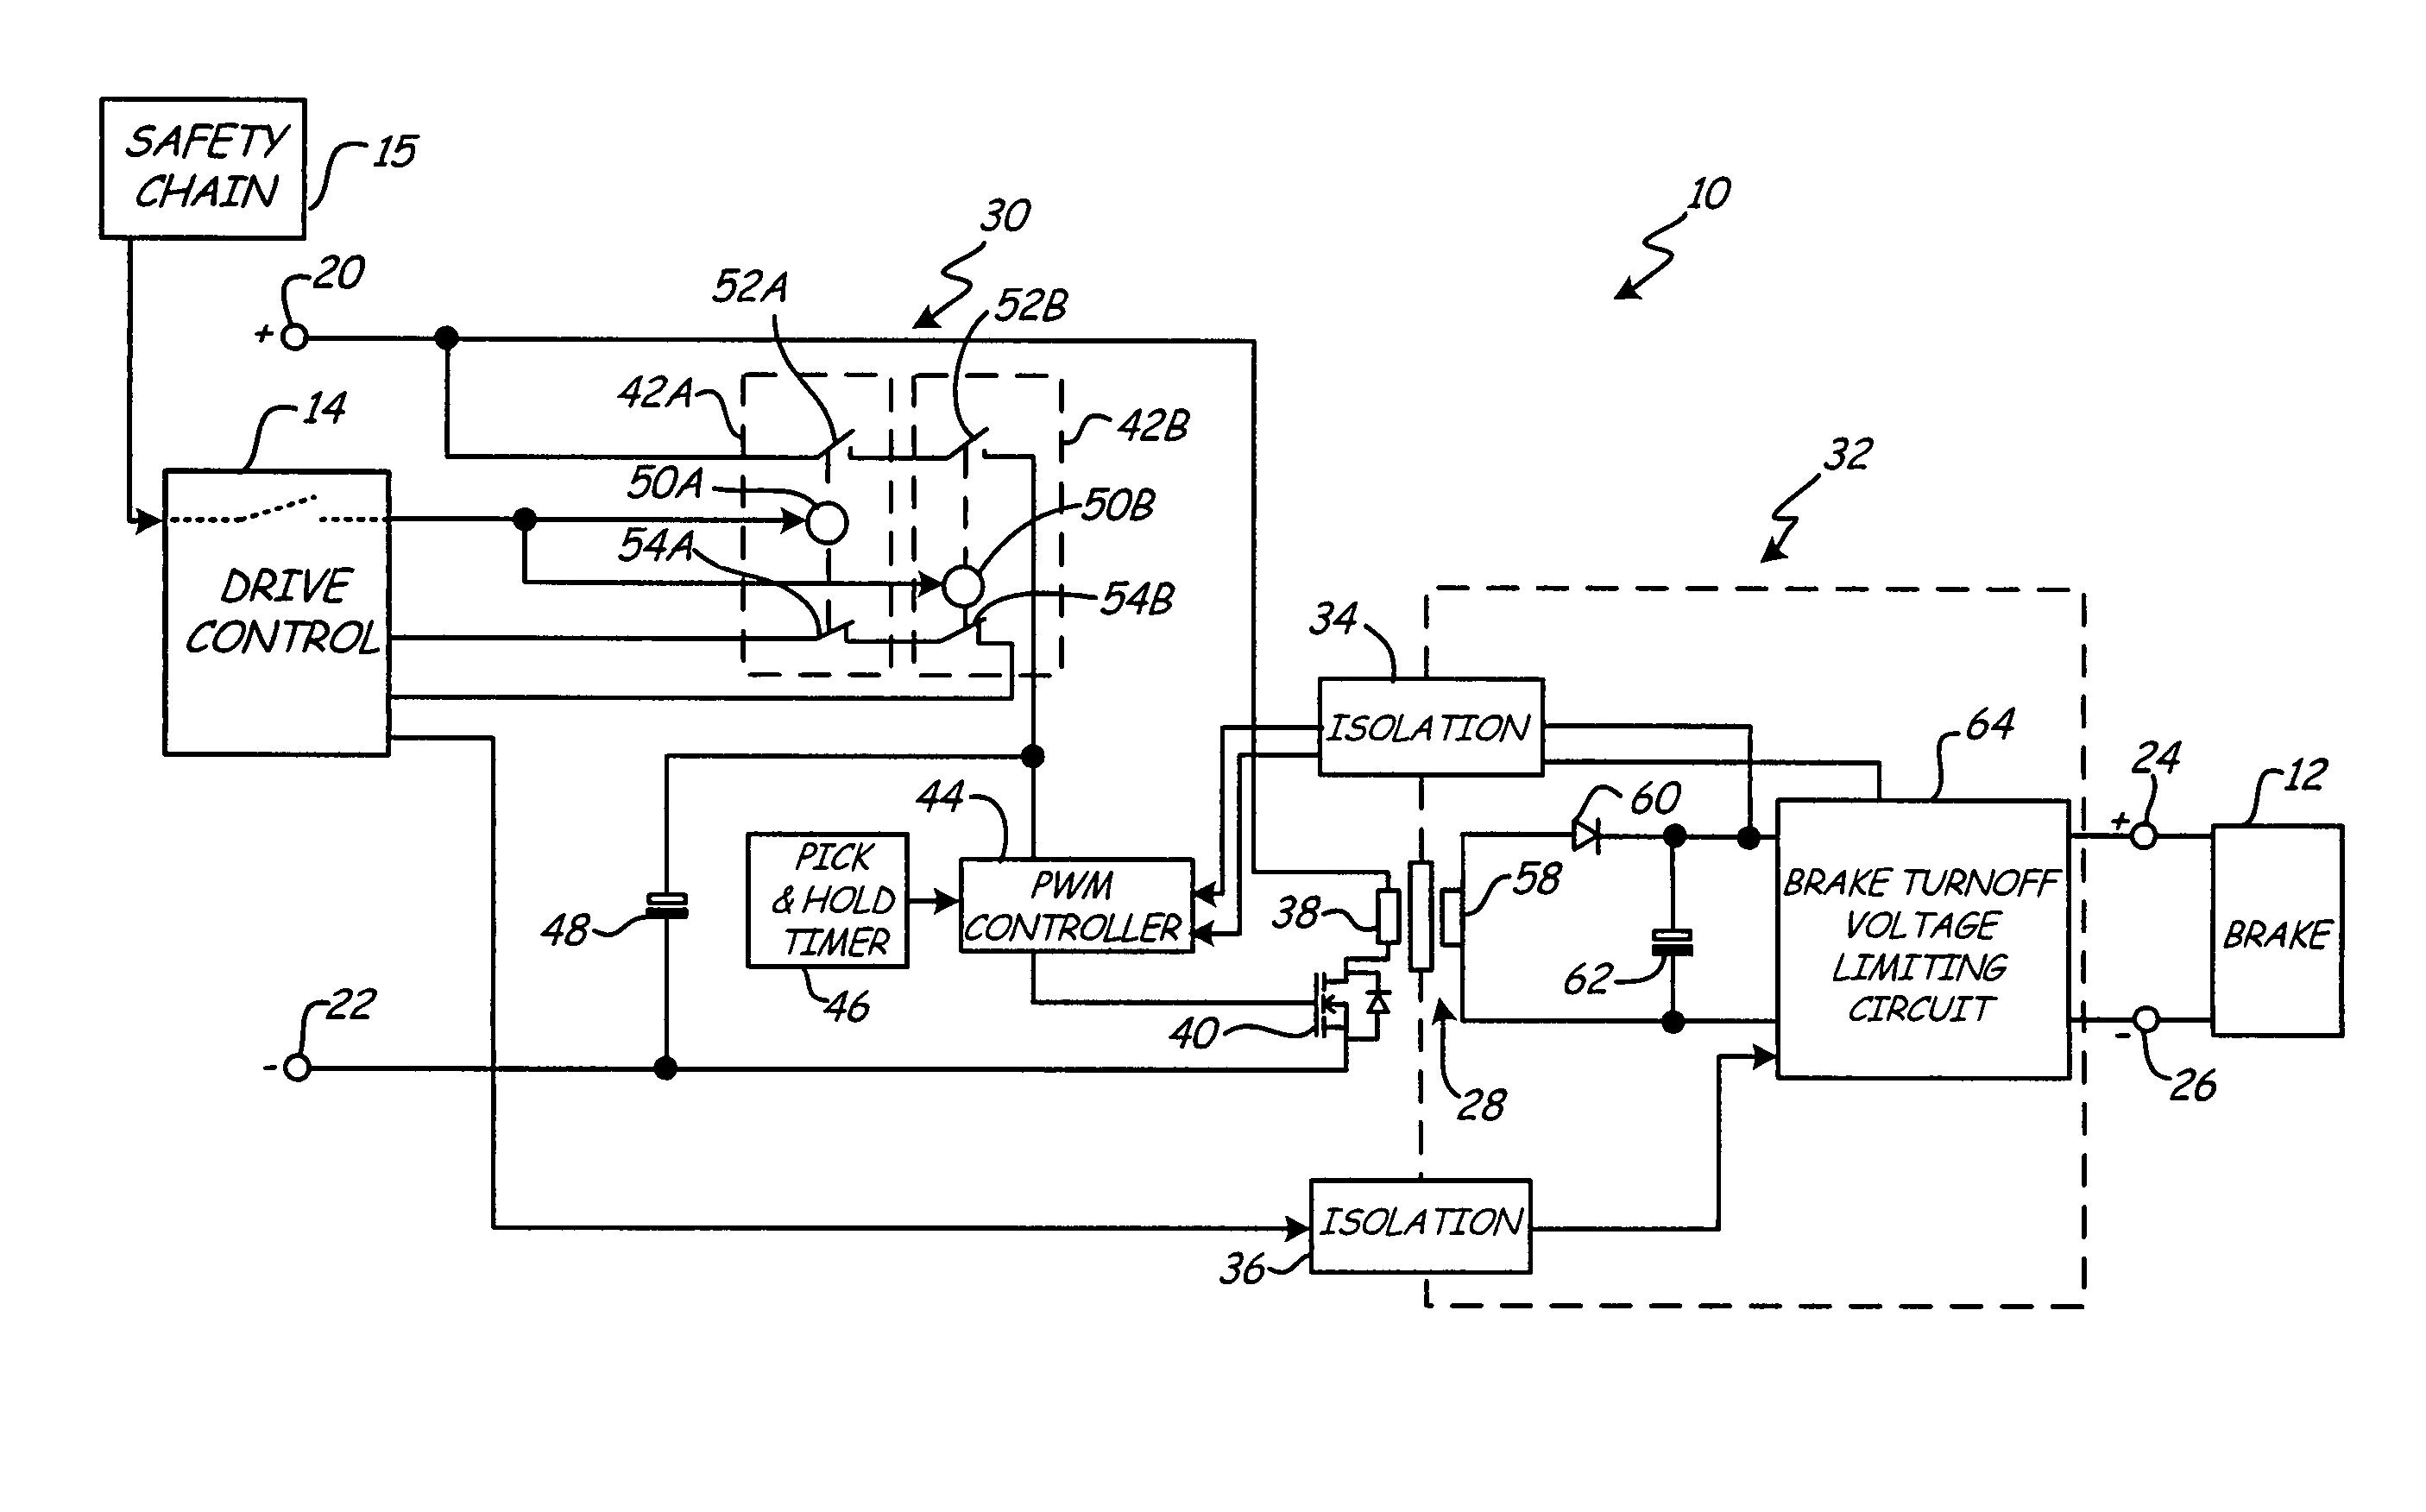 1994 Chrysler New Yorker Fuse Diagram Bmw Timing Belt For Wiring Diagram Schematics